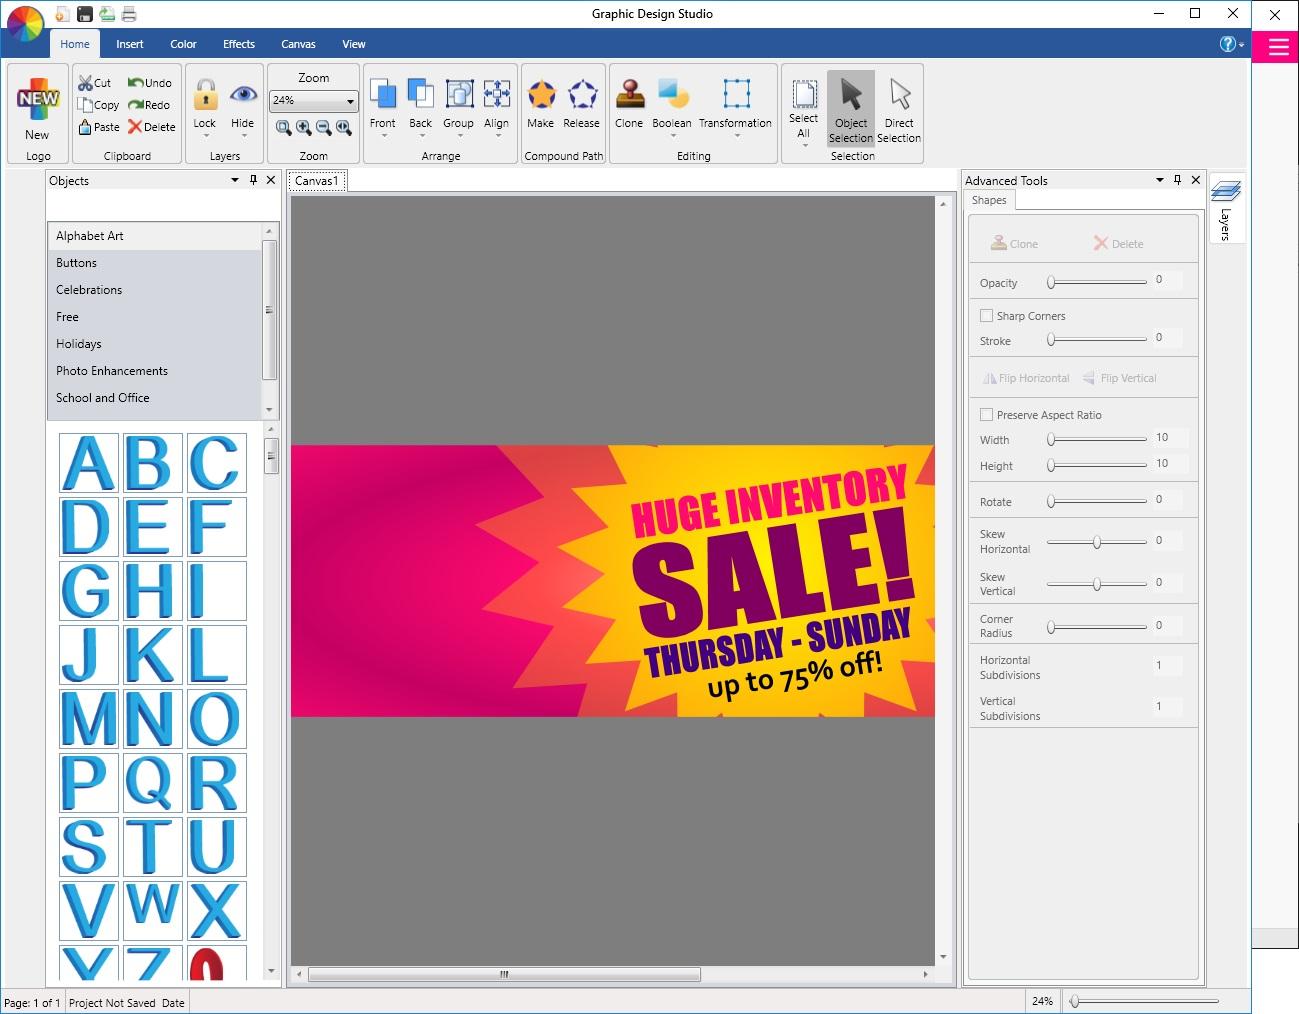 Summitsoft Graphic Design Studio v1.7.7.2 - ENG